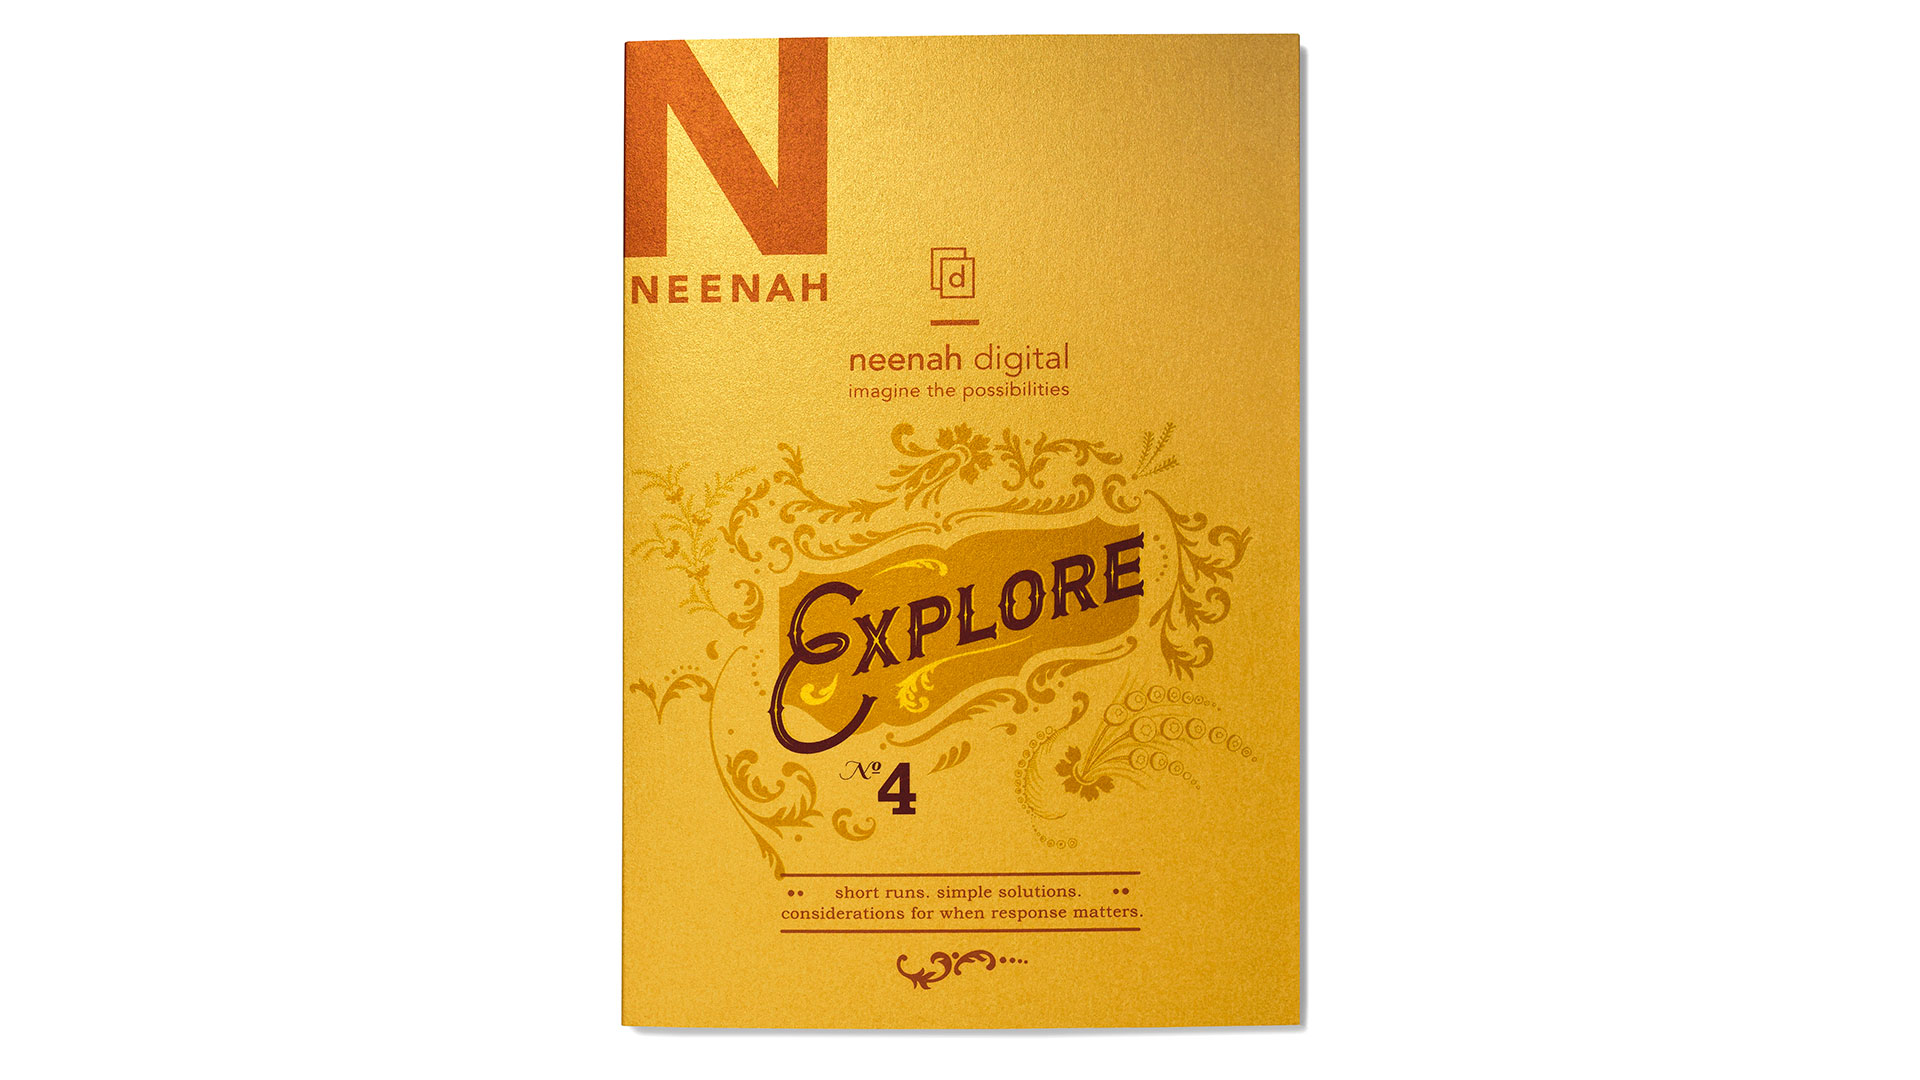 neenah-explore4-1